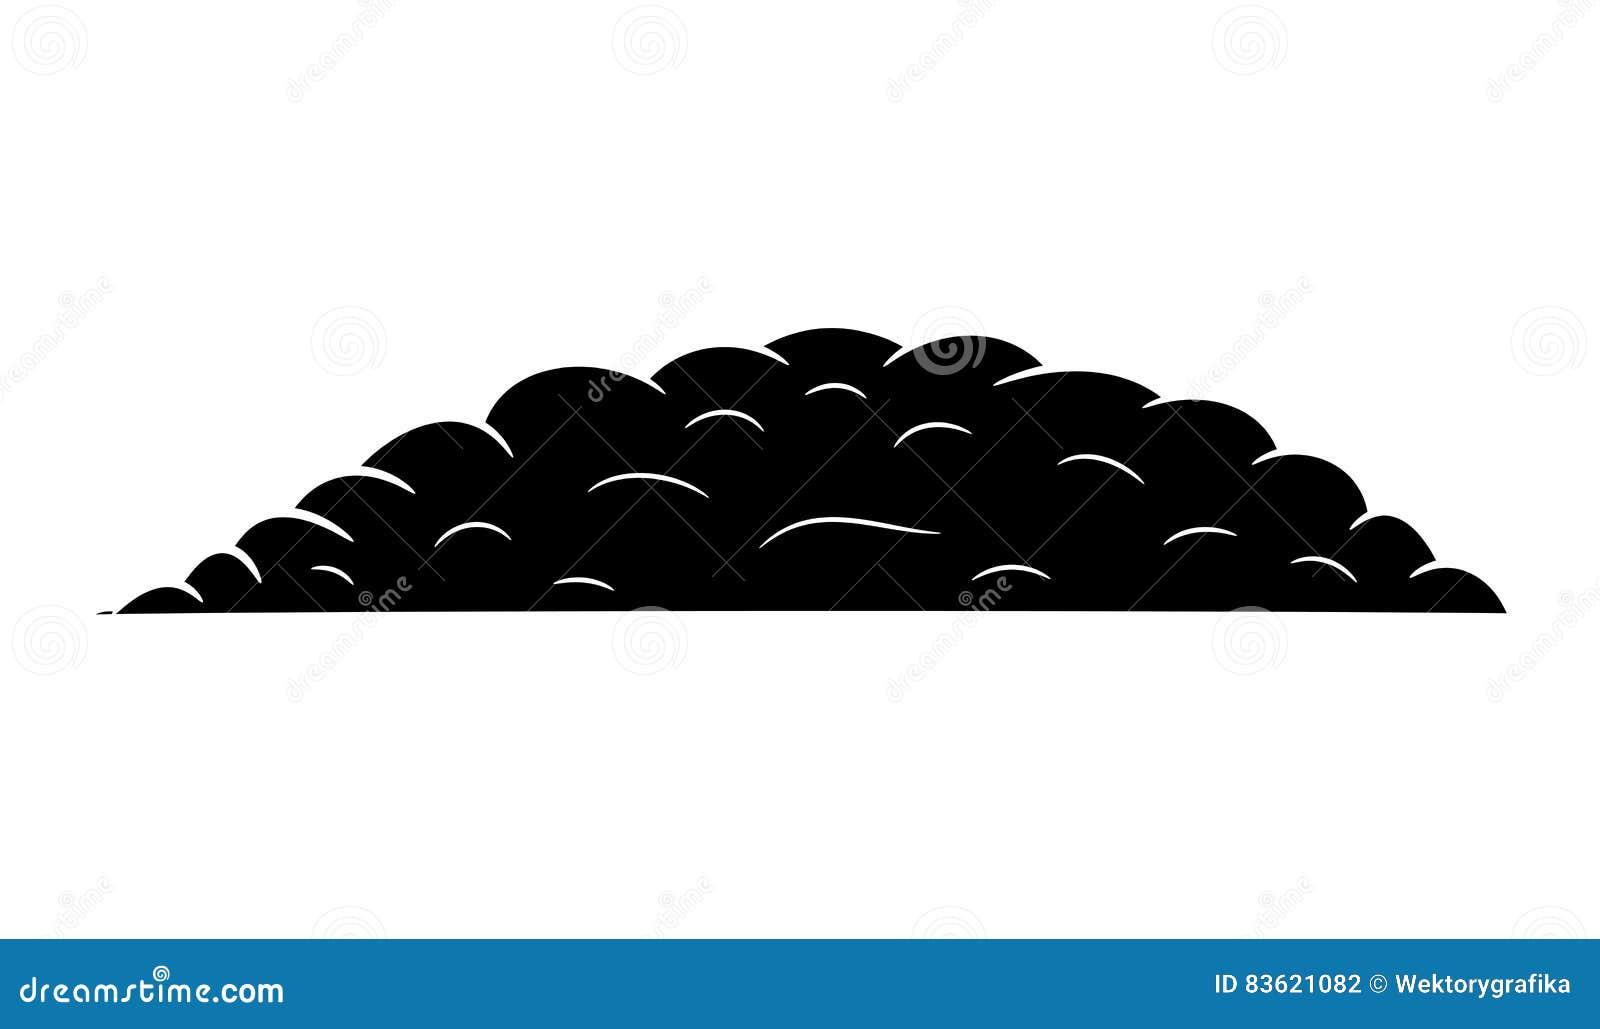 Pile Of Ground Silhouette Vector Symbol Icon Design. Stock ...Pile Icon